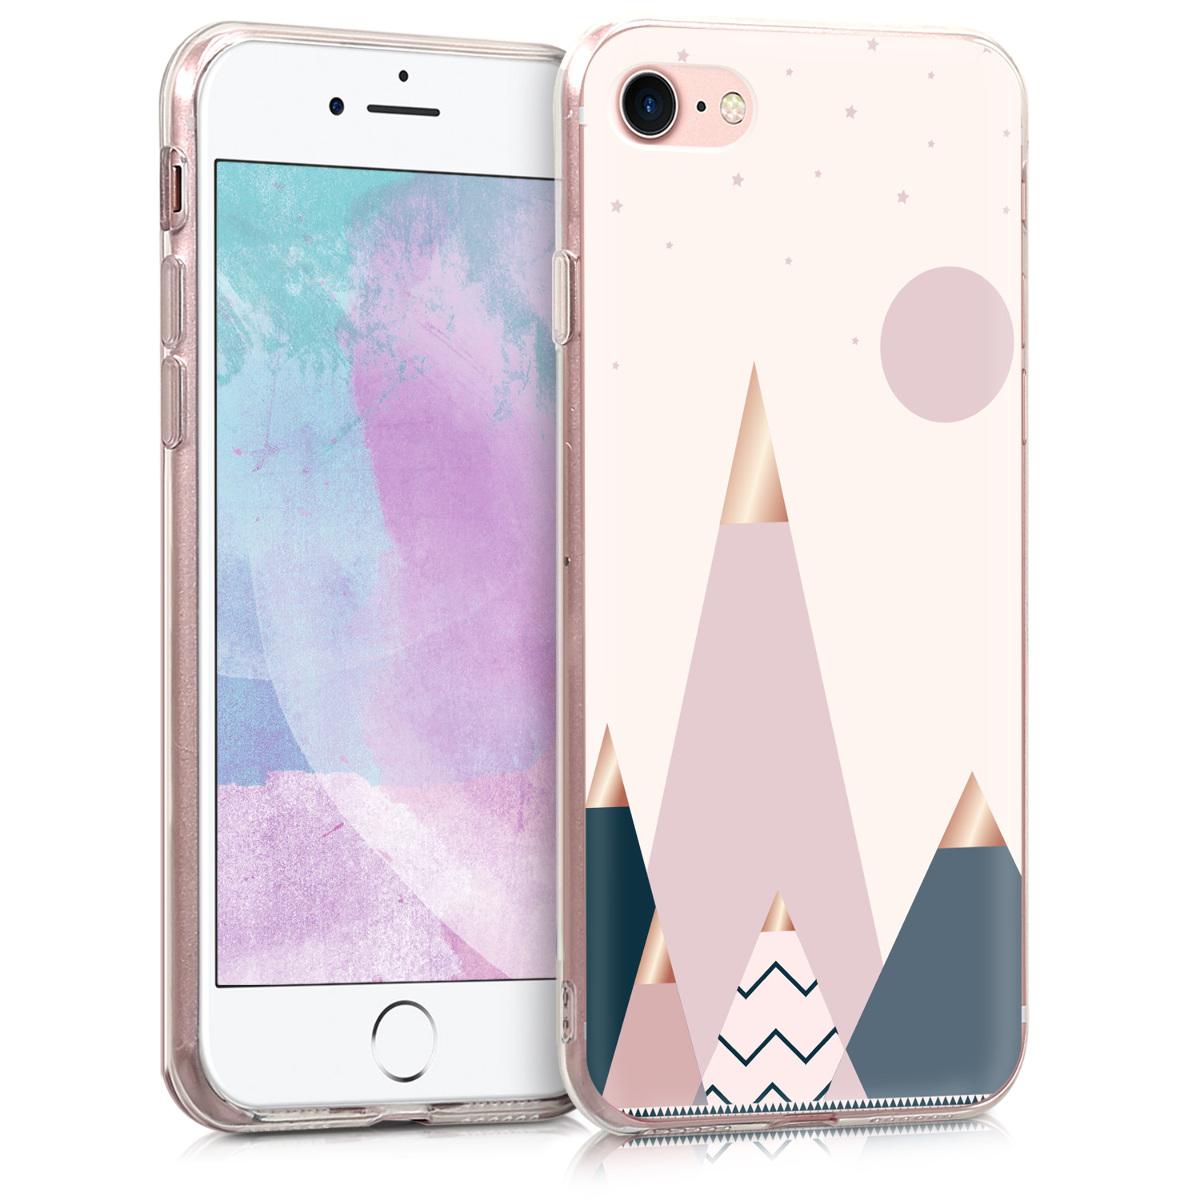 KW Θήκη Σιλικόνης iPhone 7 / 8 - Rose Gold / Blue / Light Pink (46227.35)